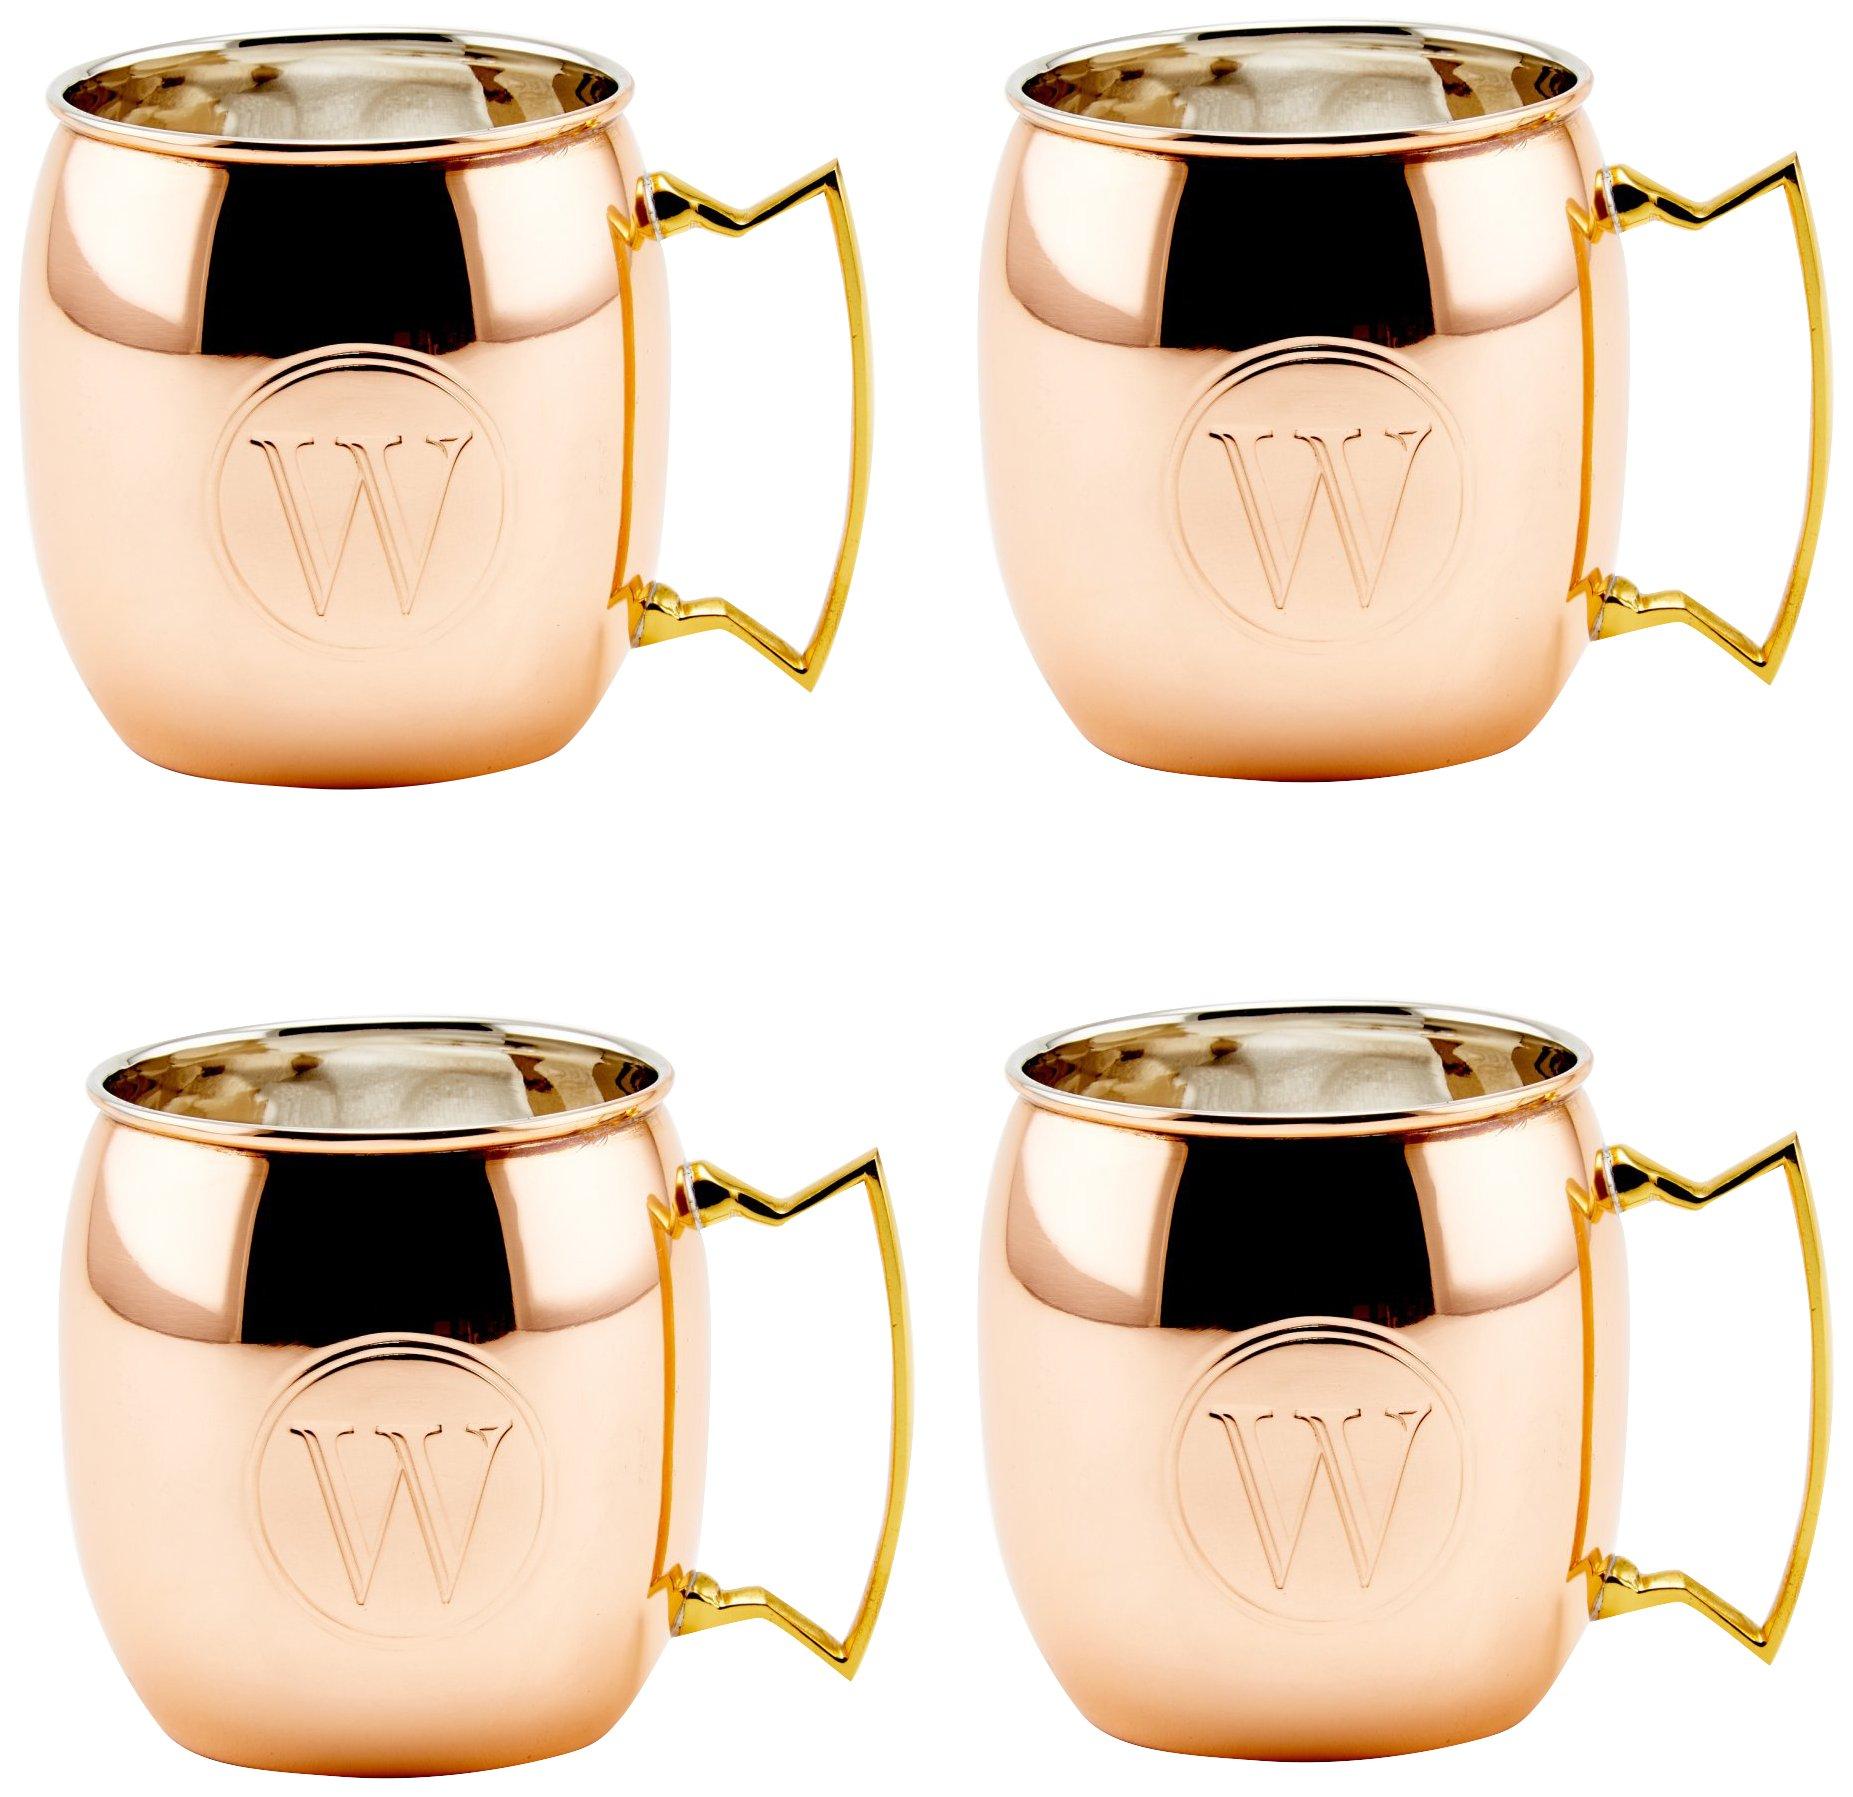 Old Dutch International OS428MW Solid Moscow Mule Mug, 16-Ounce, Monogrammed W, Copper, Set of 4